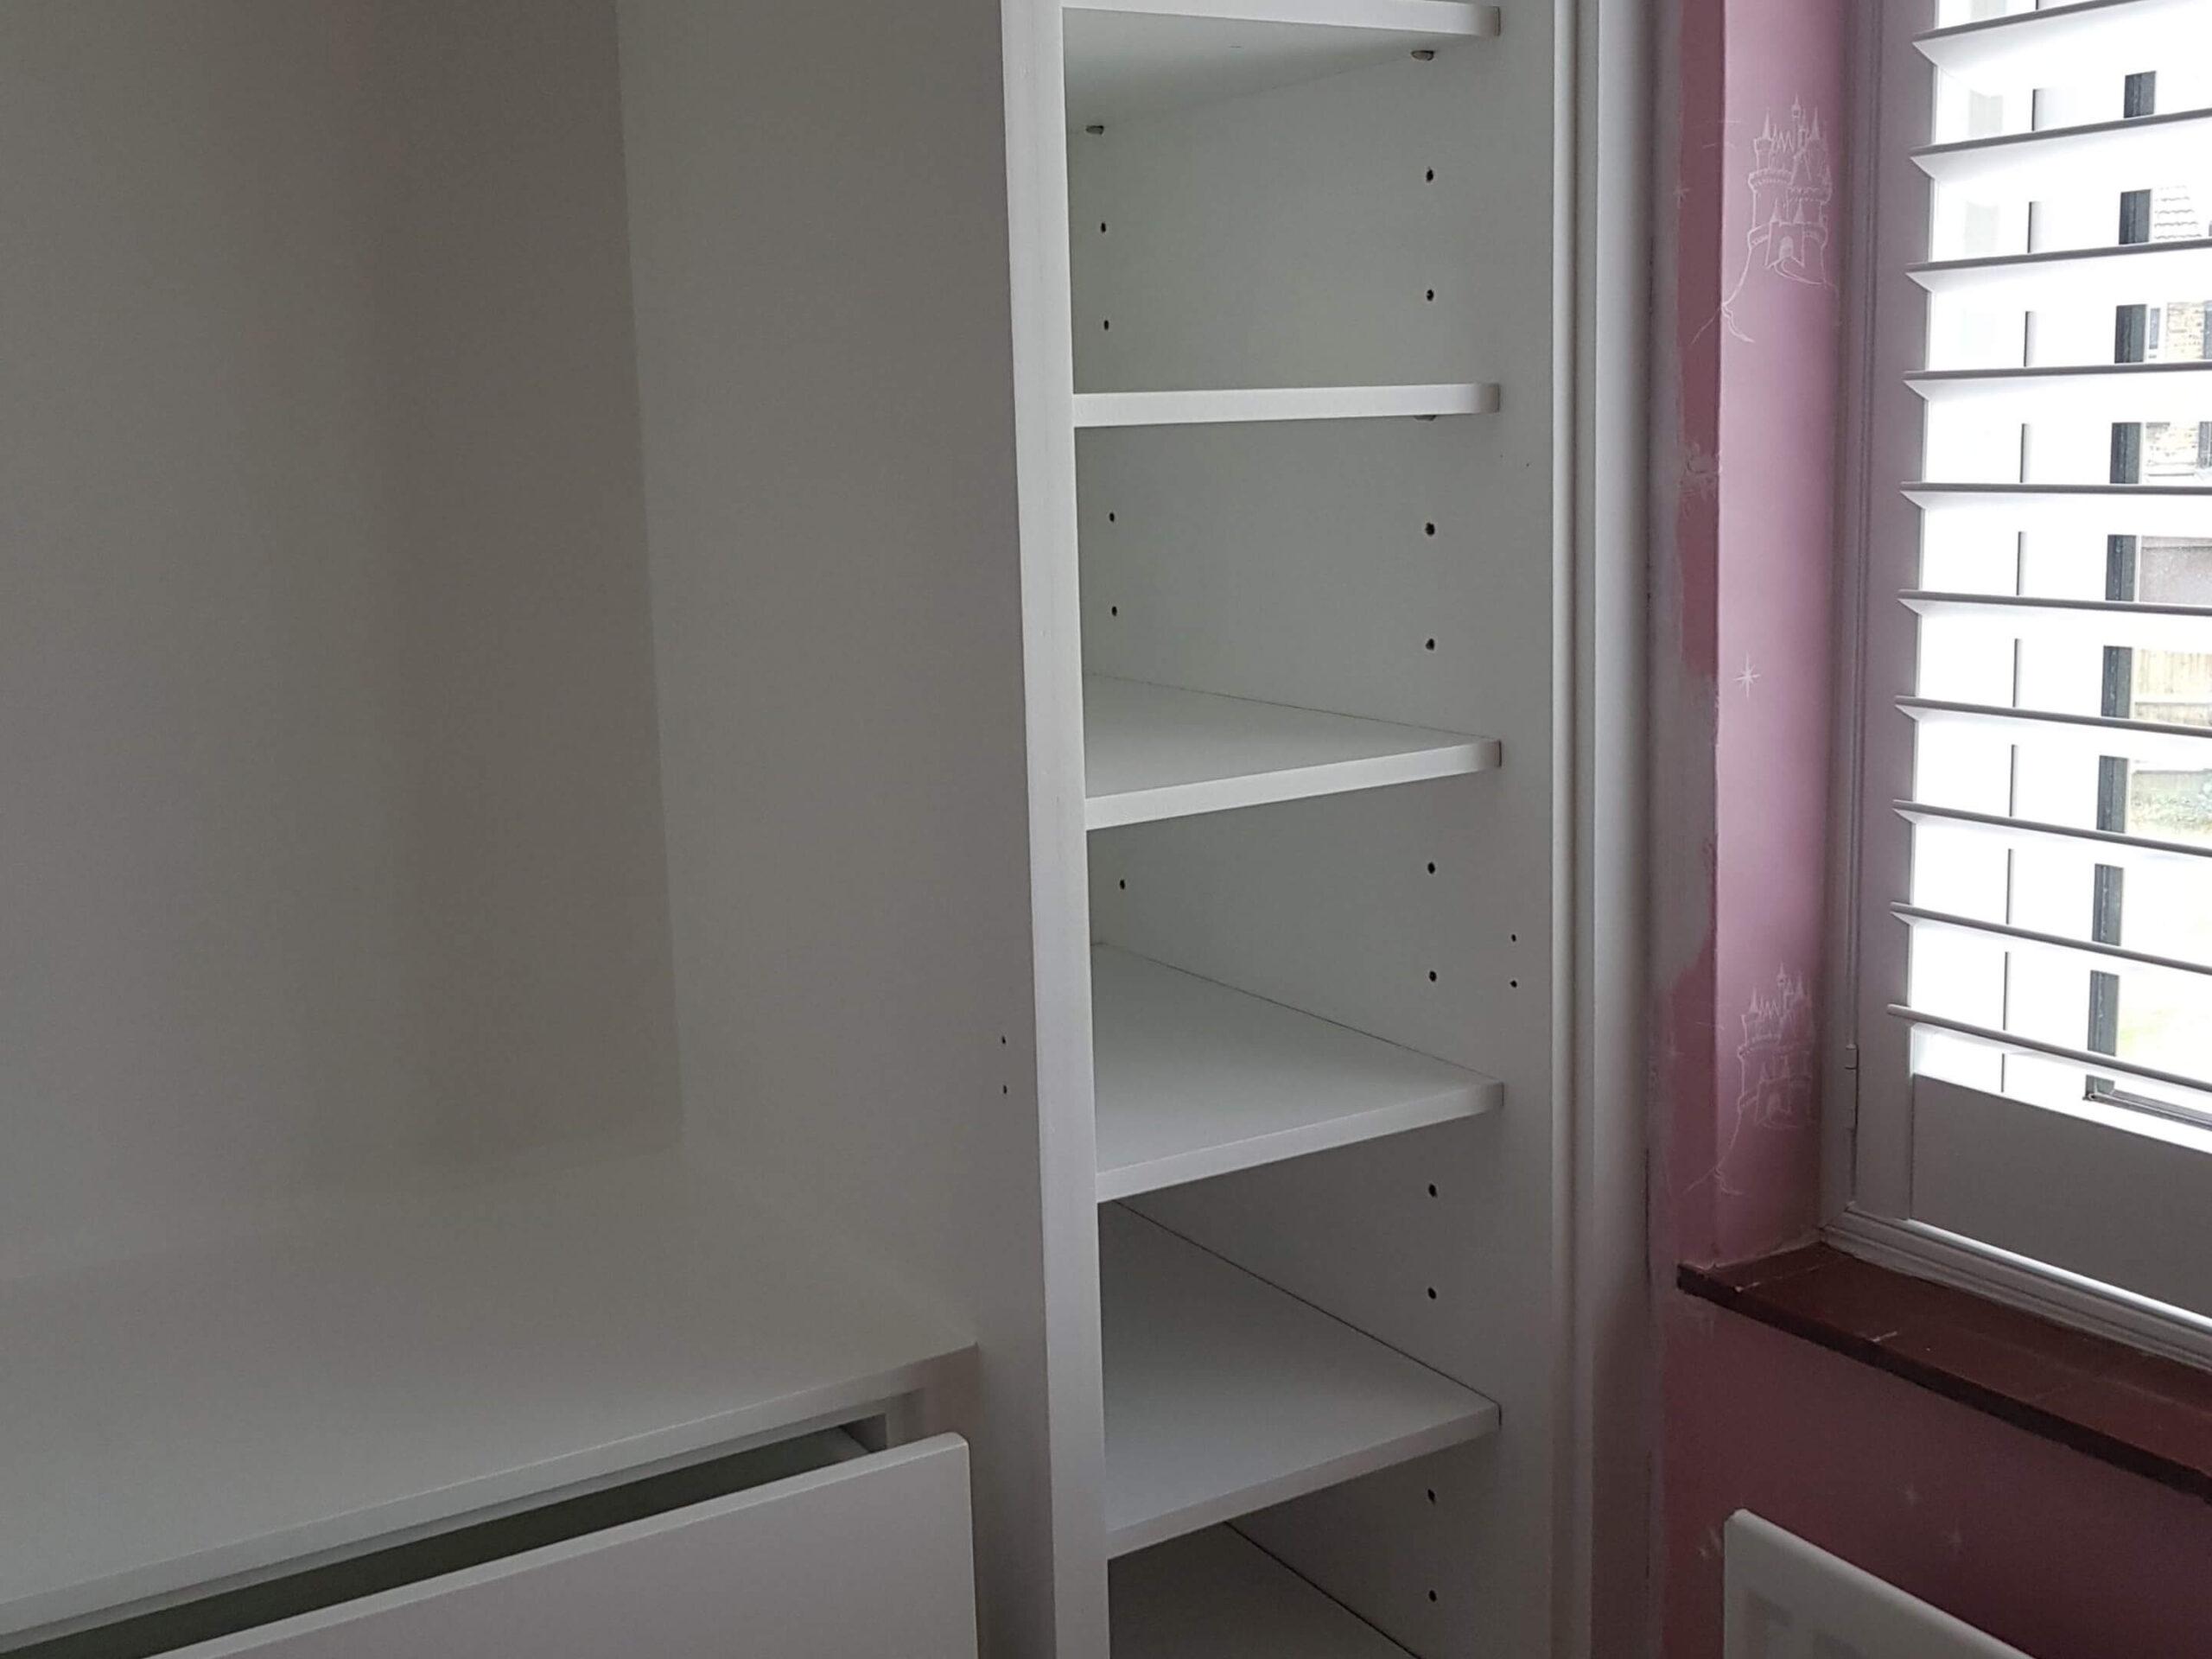 Room makeover 2